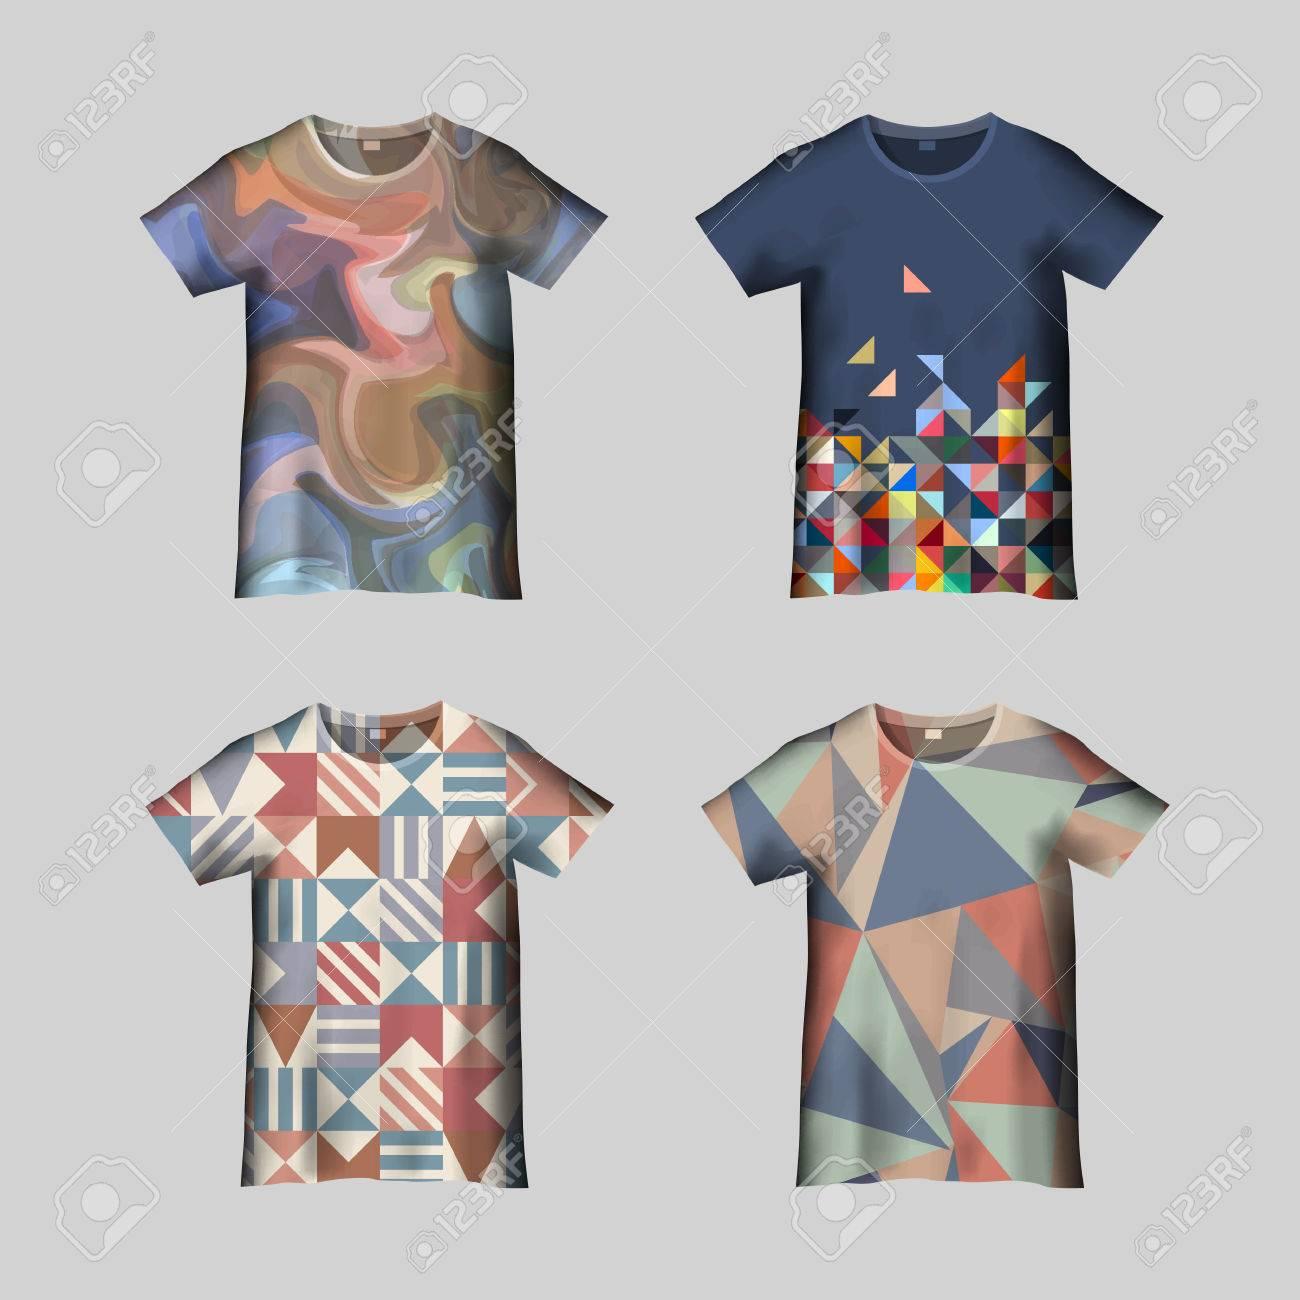 Shirt design vector pack - T Shirt Design Print Design T Shirt Template With Abstract Pattern